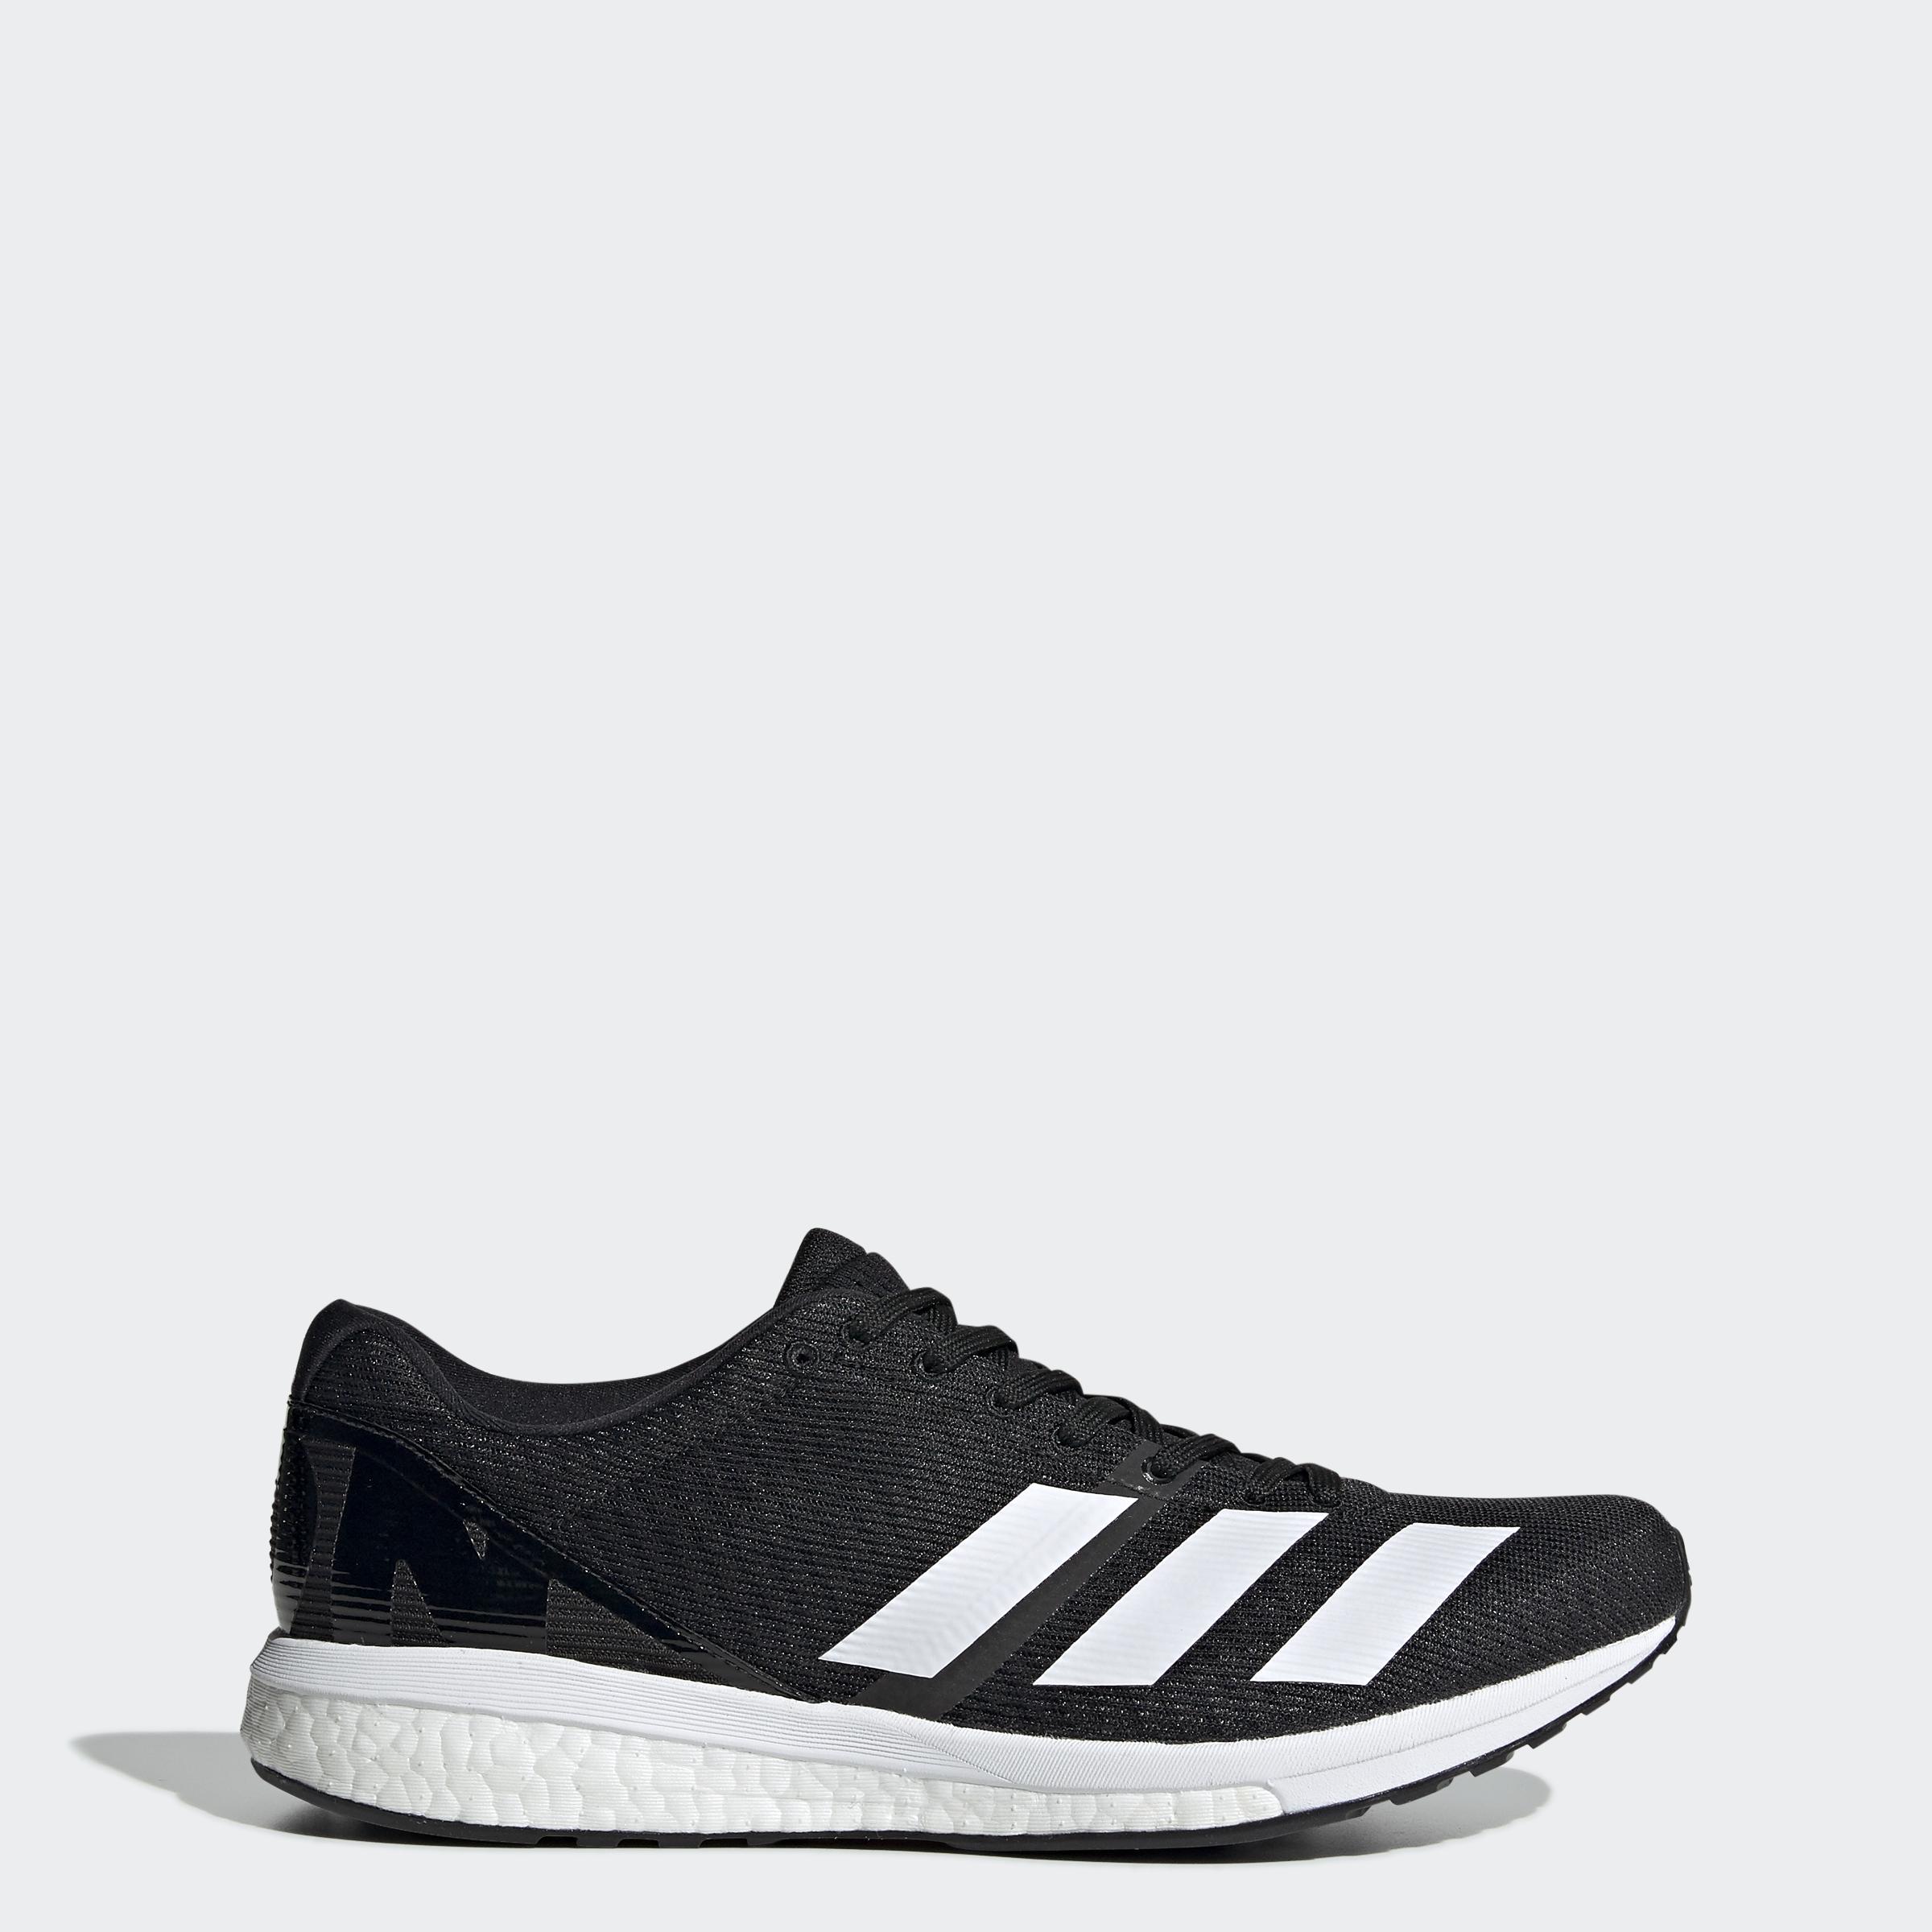 Adidas Men's Boston Boost 8 $52.49